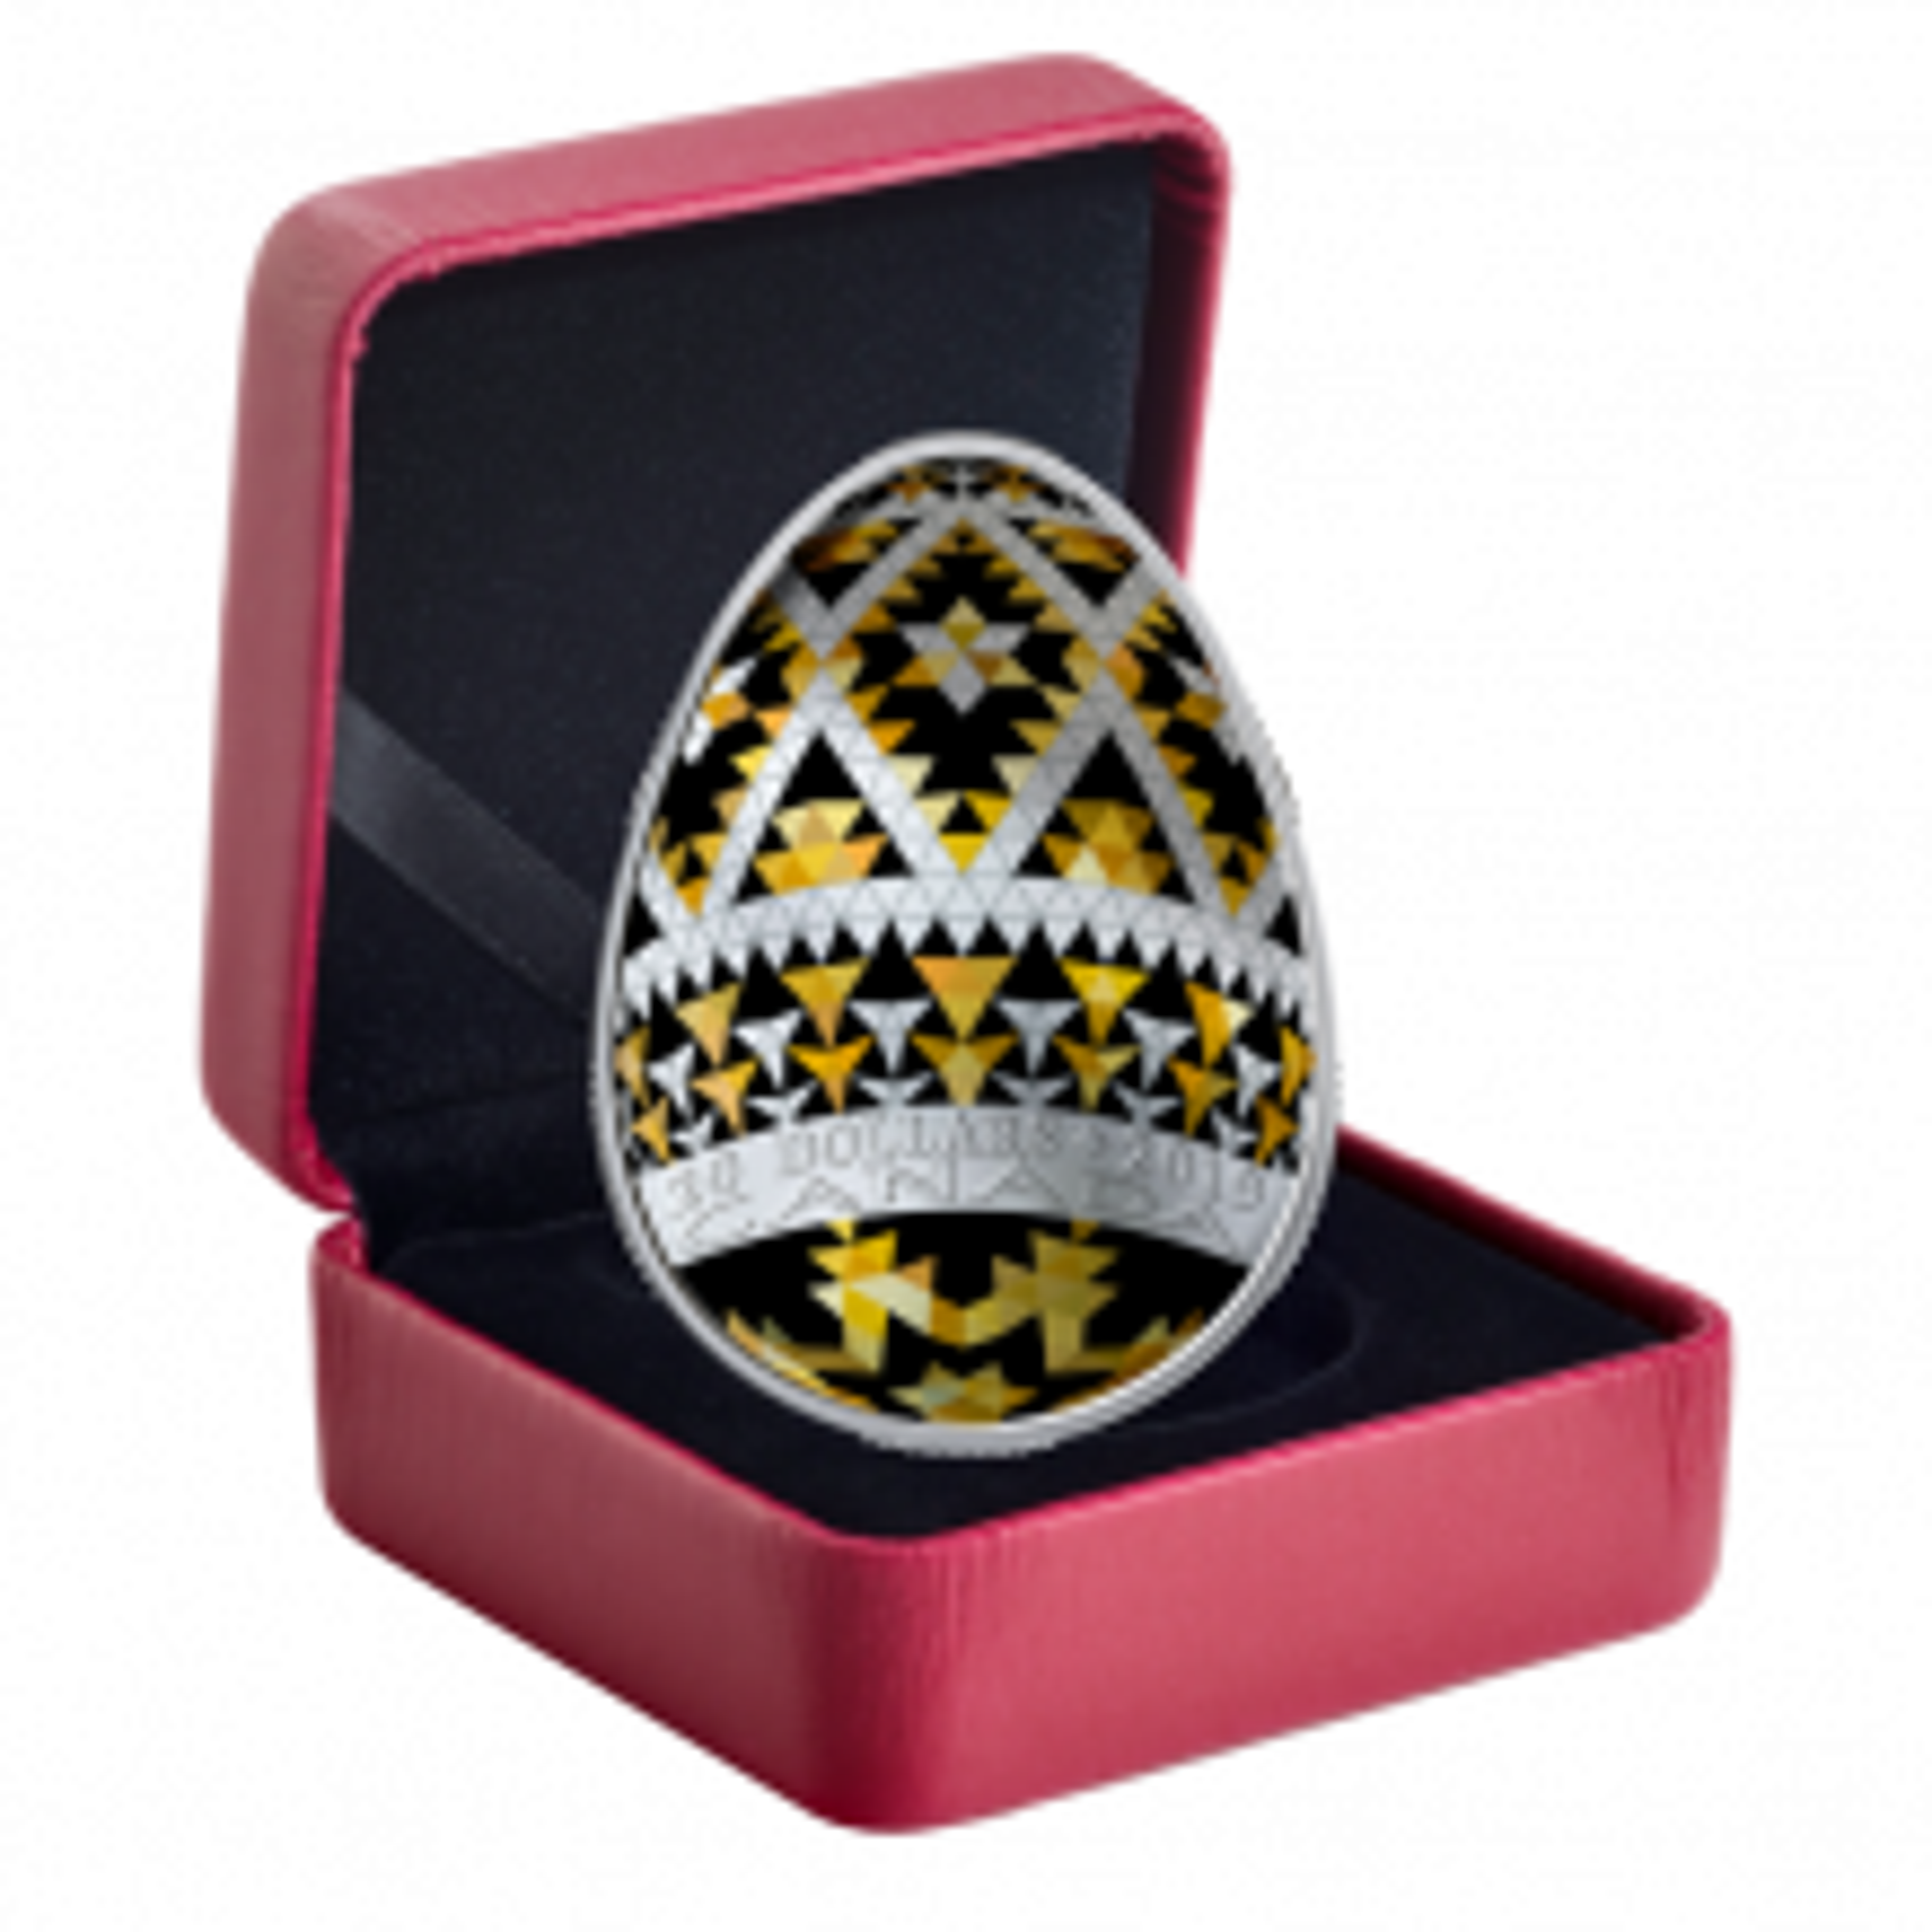 1 Troy ounce silver coin Pysanka Egg 2019 Proof